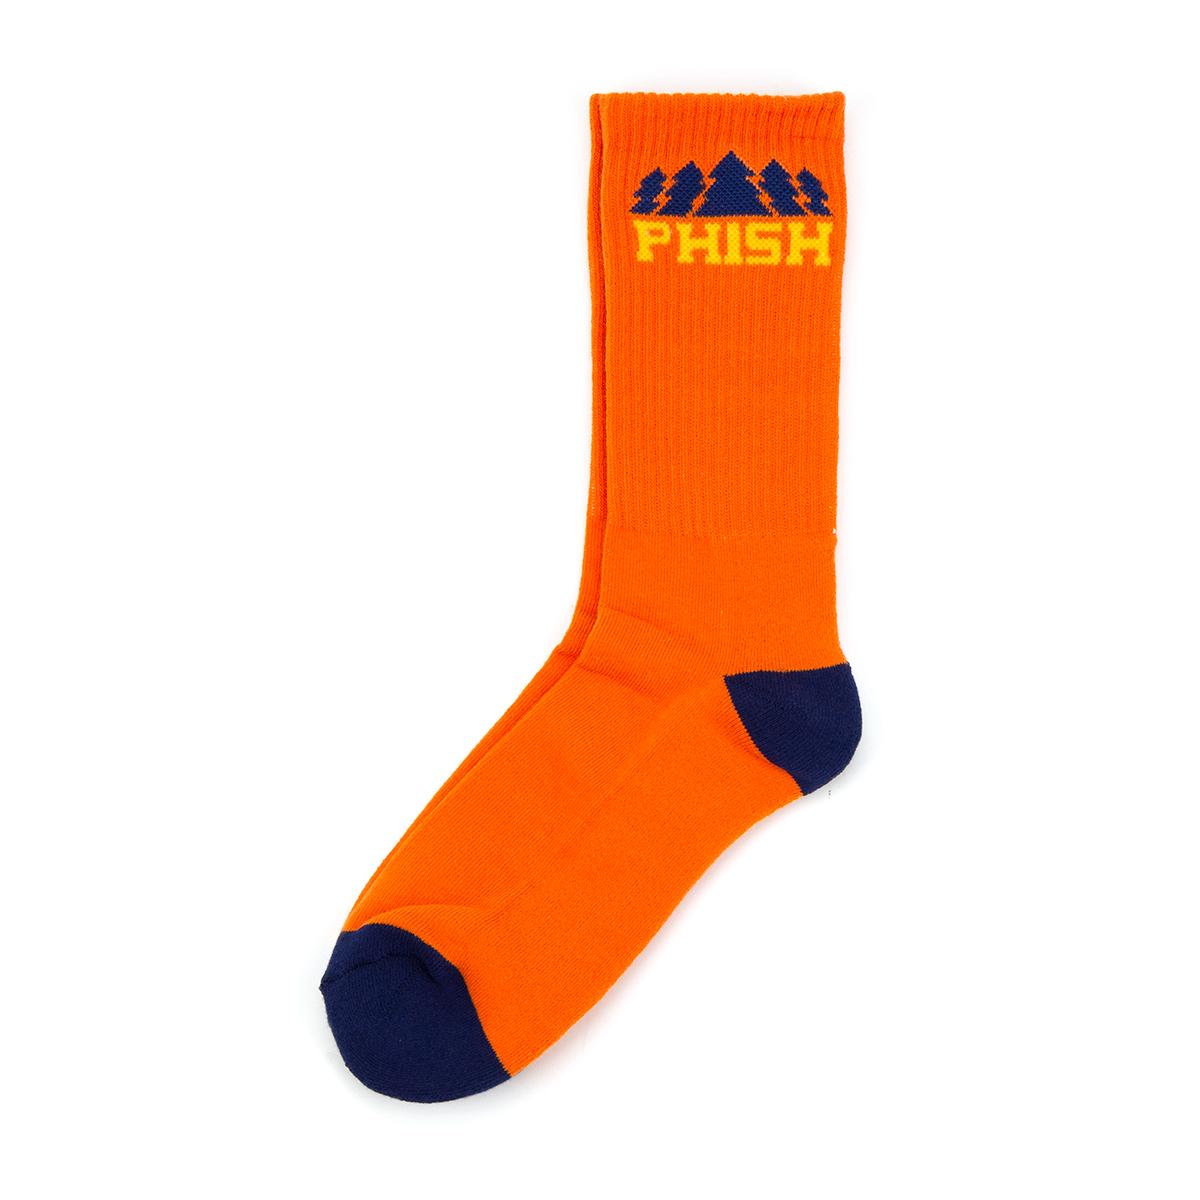 Timber Socks